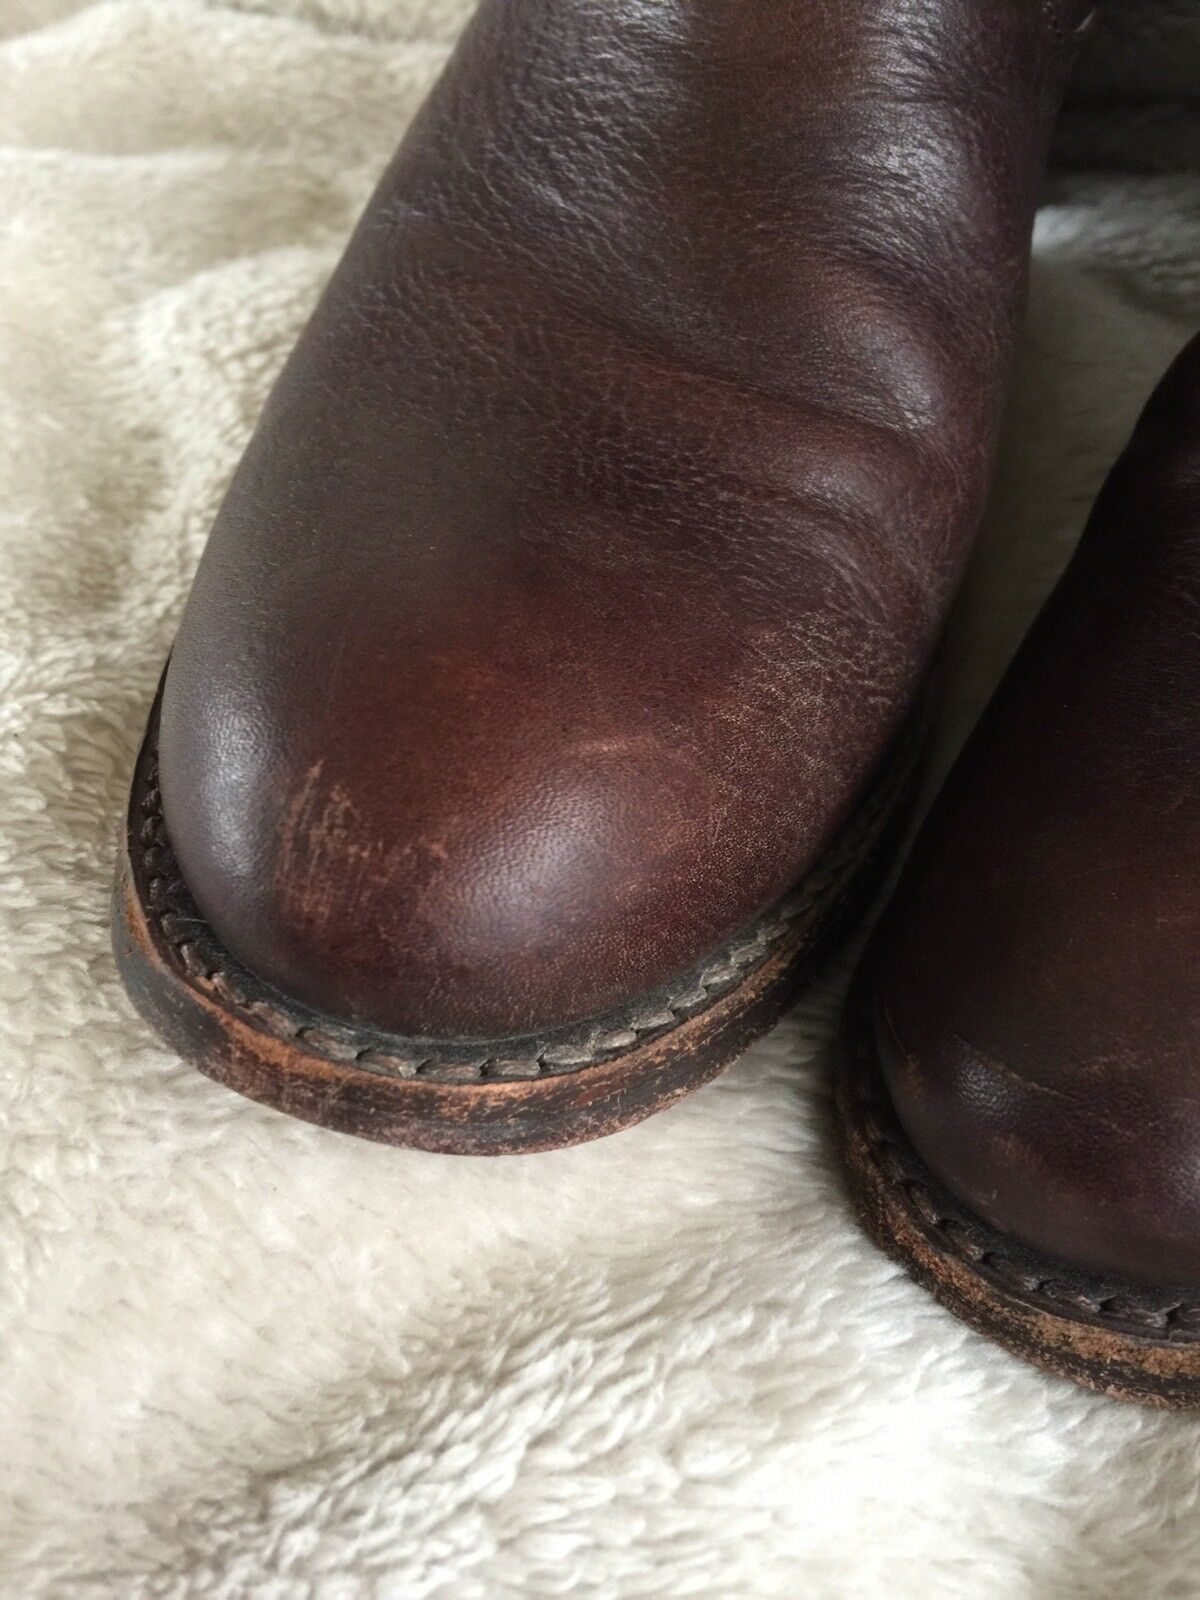 Frye Jane strappy 9.5 dark braun leather heel heel heel tall knee Stiefel GUC 1a7c03